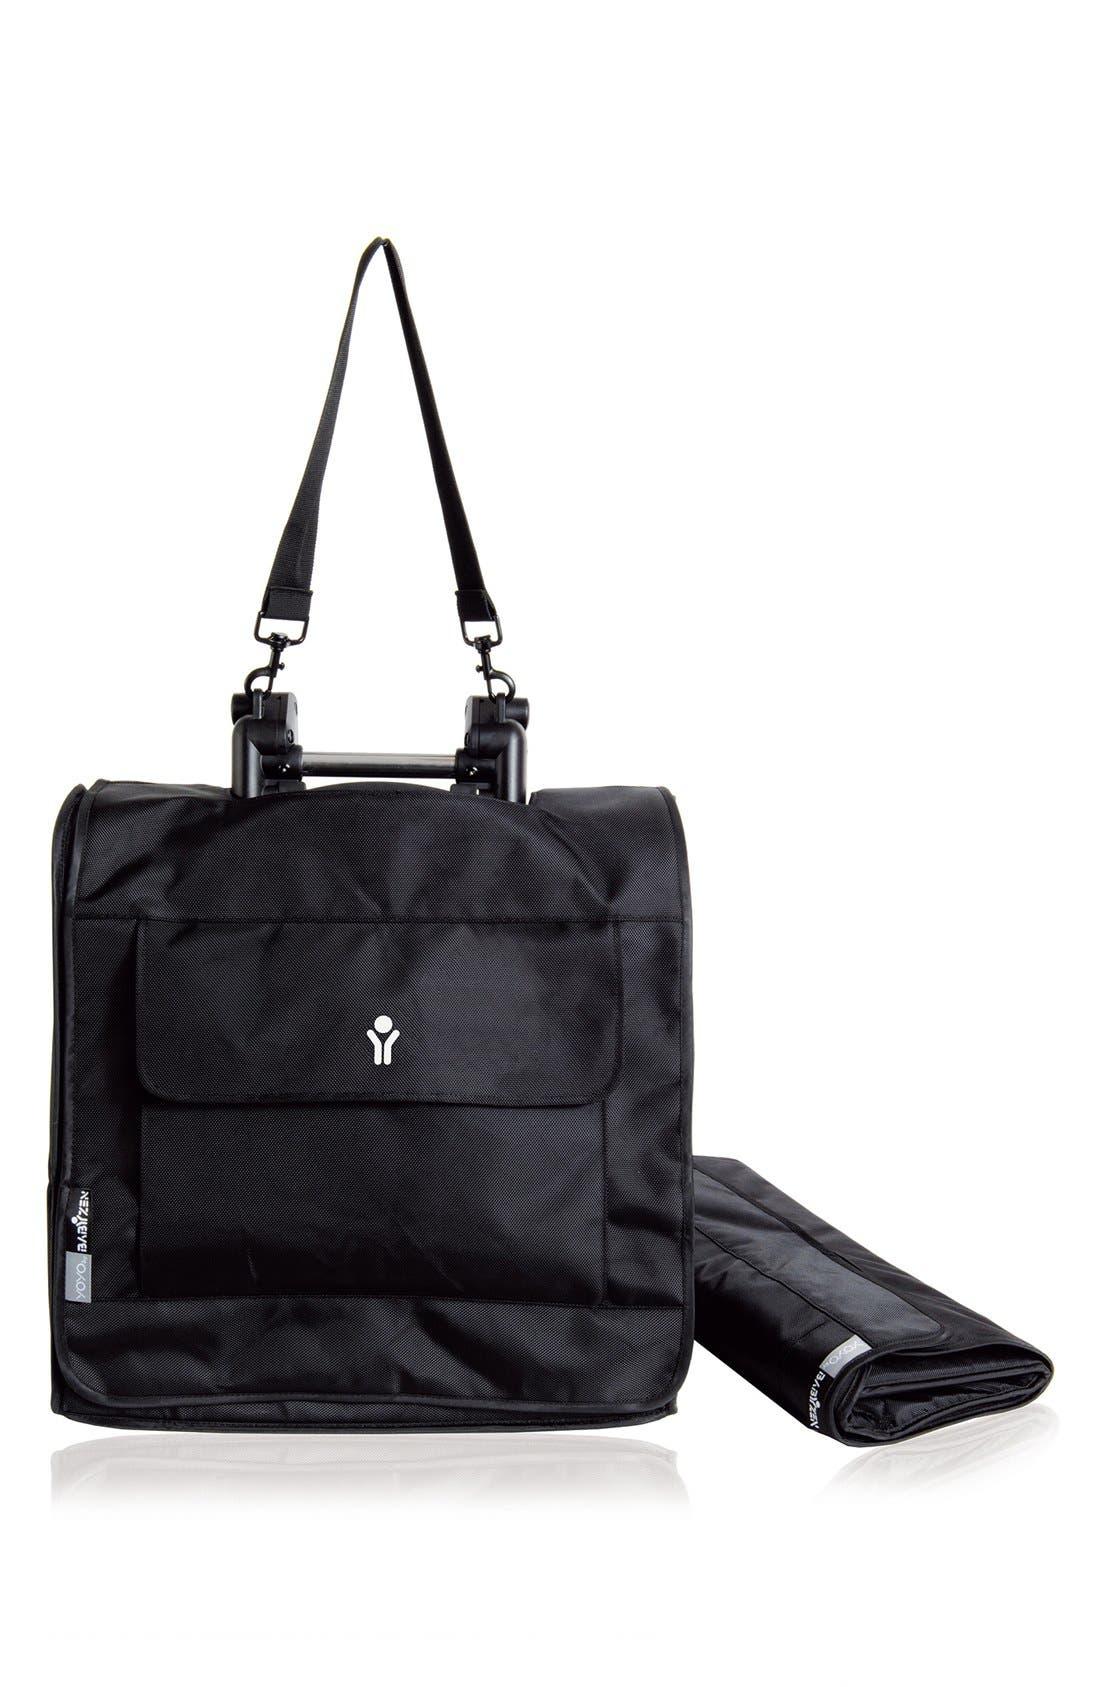 'YOYO' Stroller Travel Bag,                         Main,                         color, Black